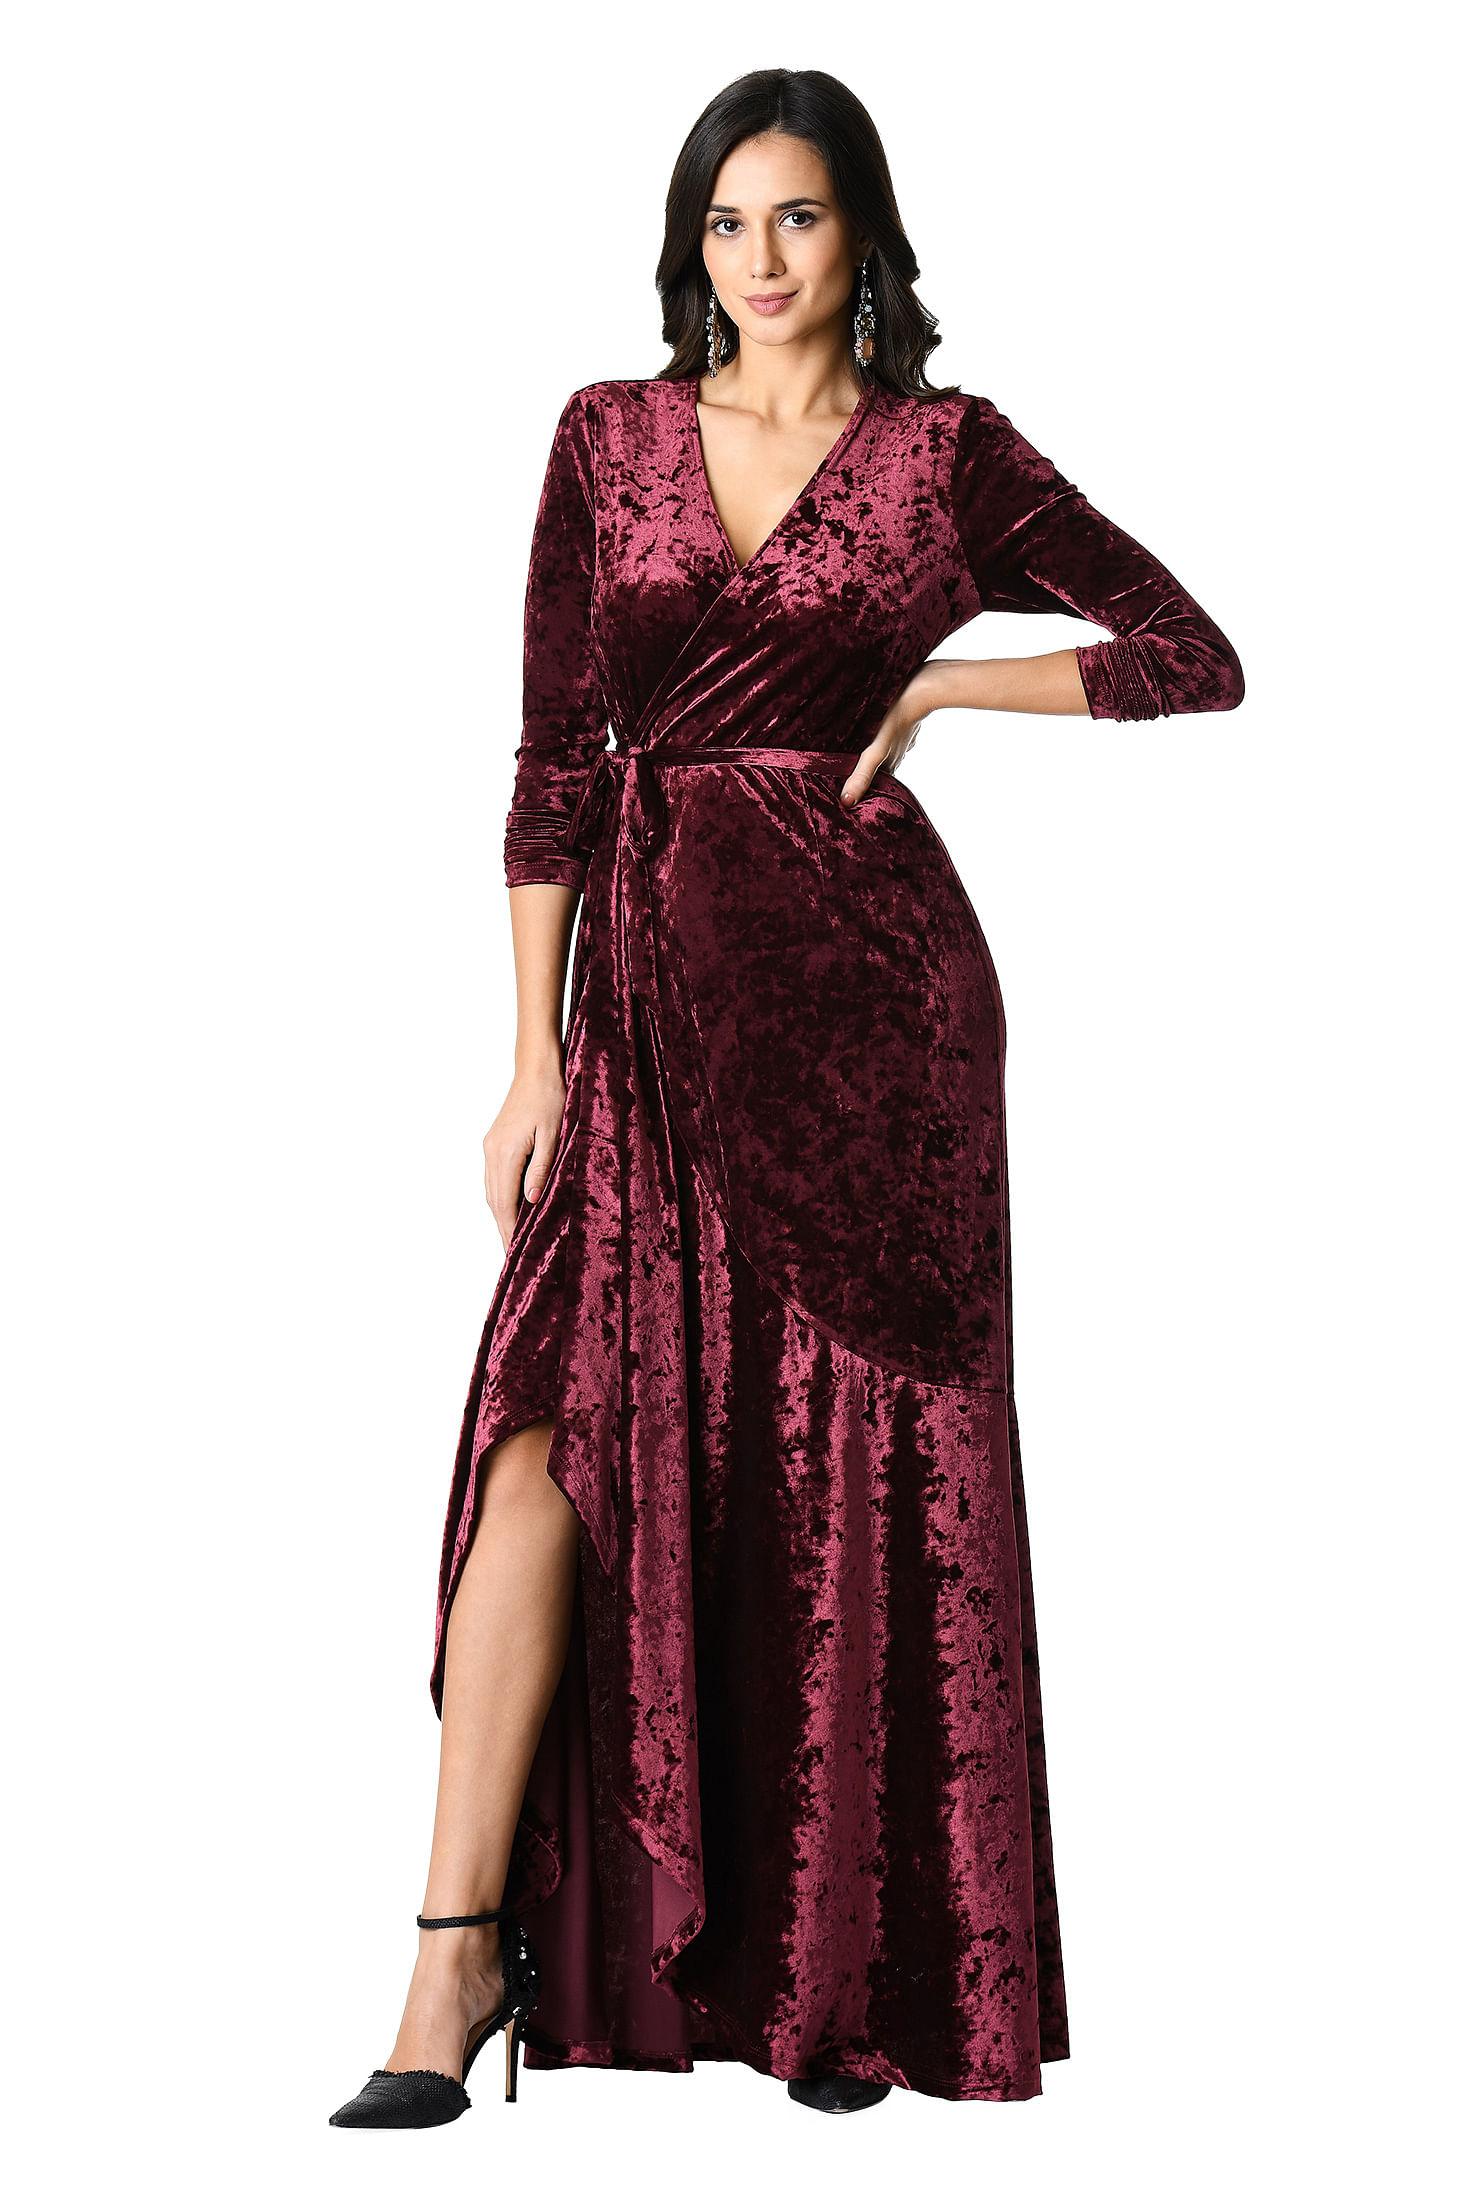 5cd47eb7f4 ... velvet maxi wrap dress. Out of Stock.